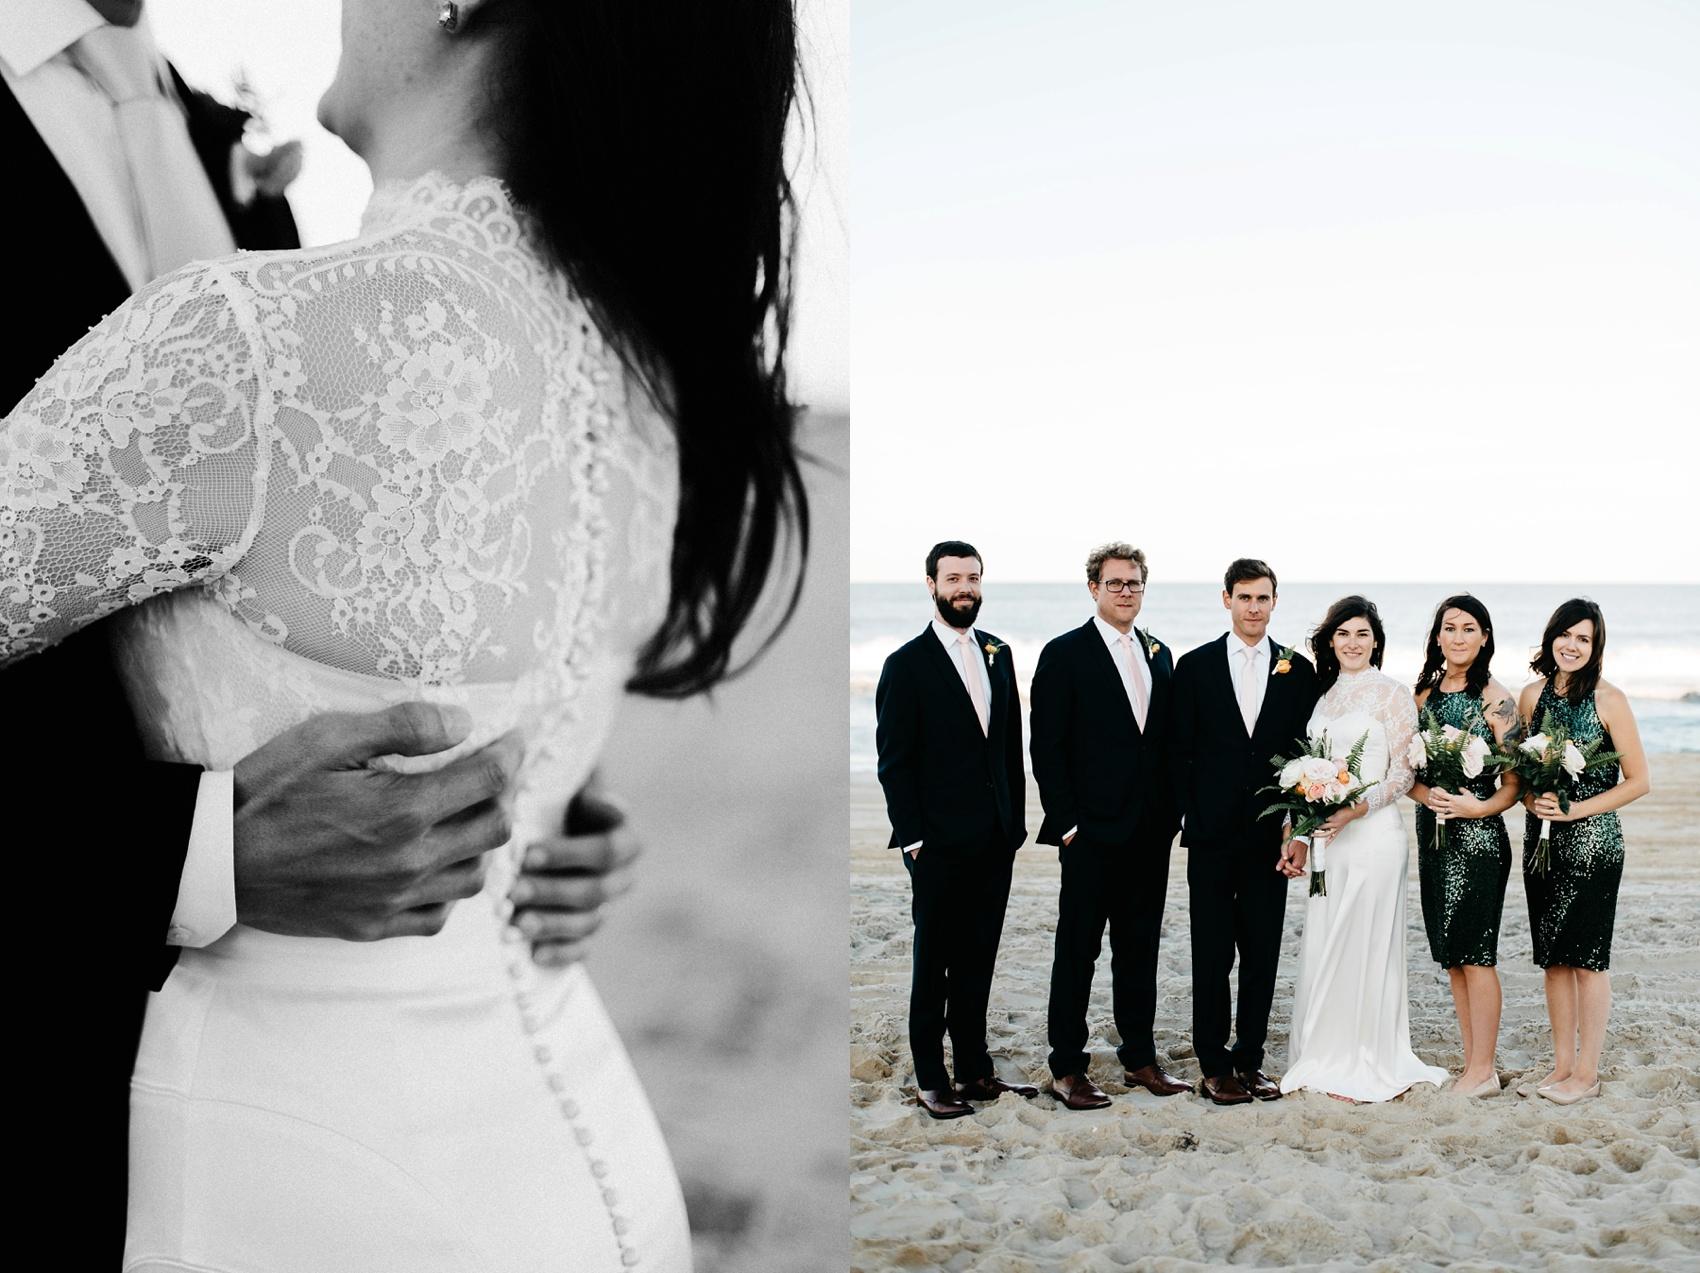 outerbanks_wedding_photographer_1304.jpg